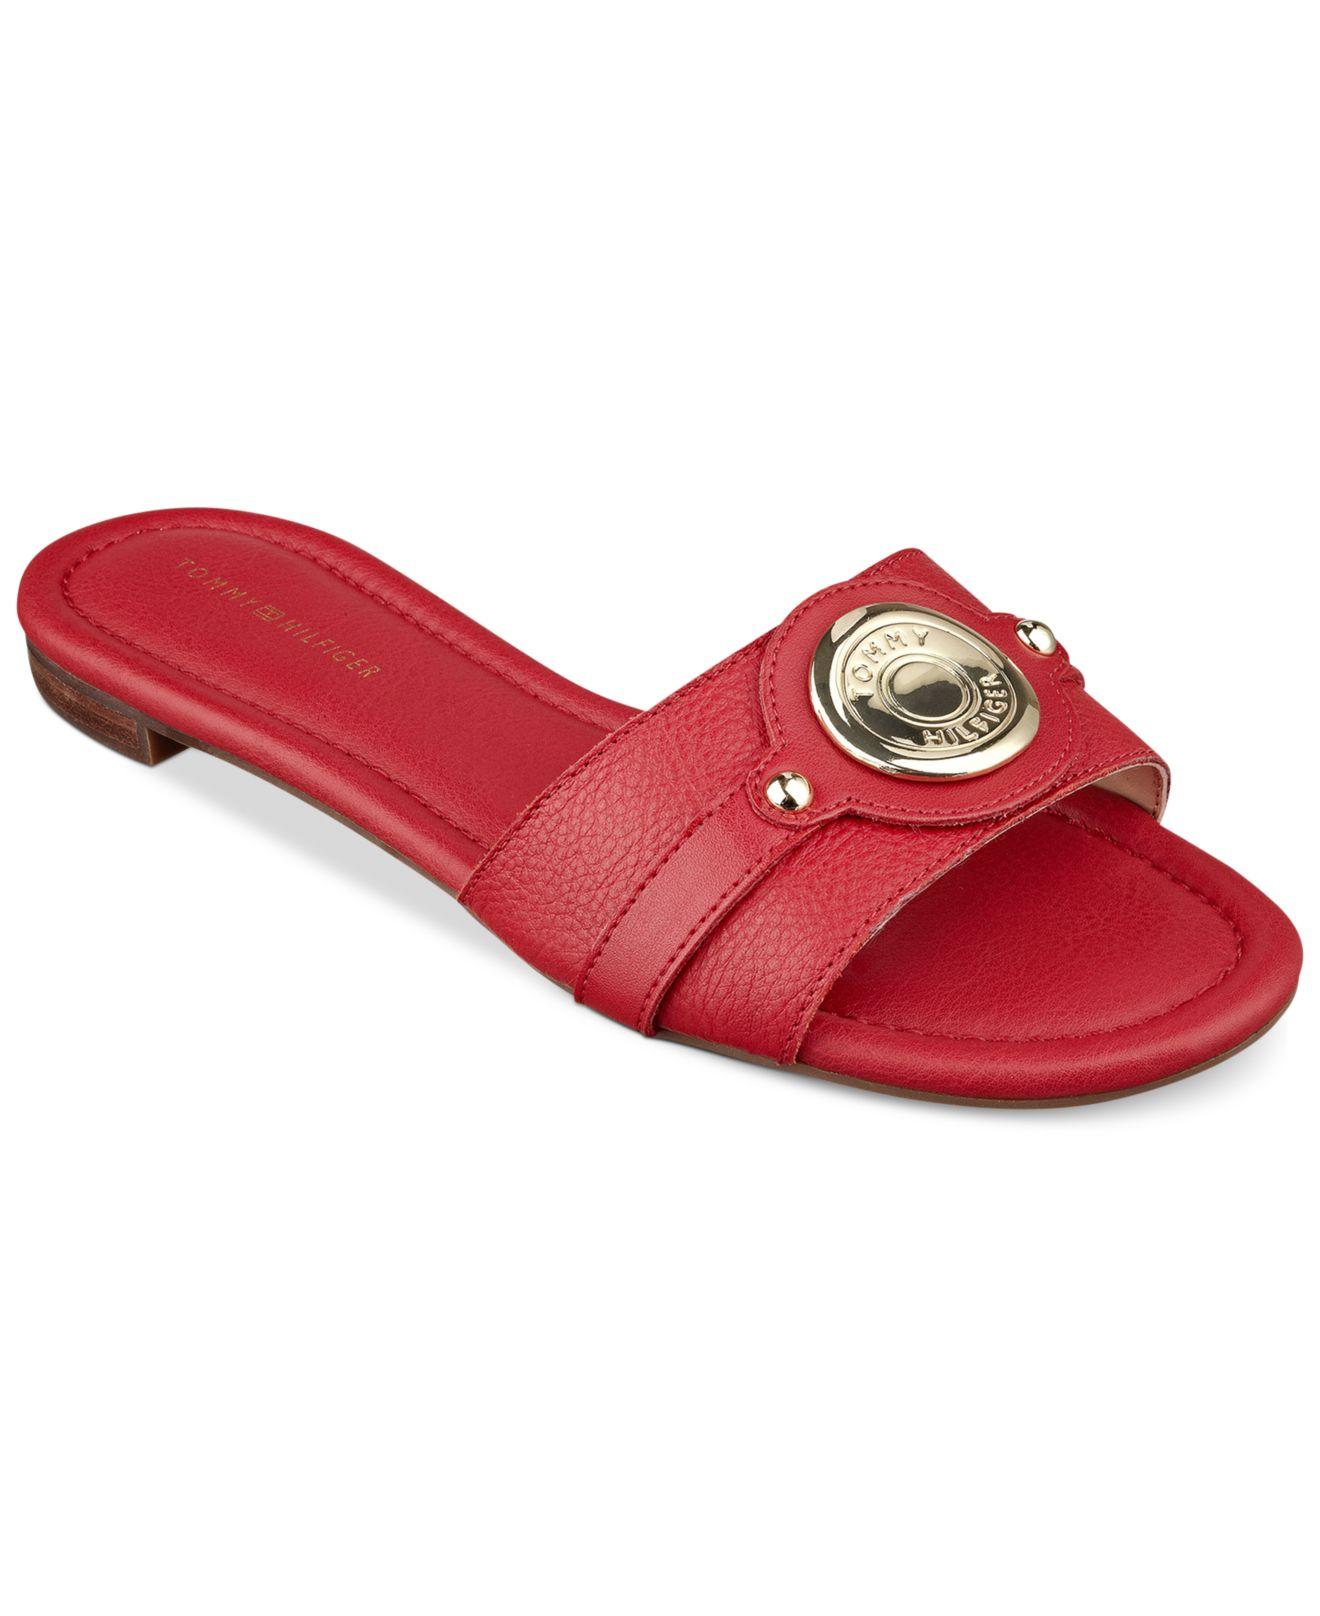 Excellent Tommy Hilfiger Women39s Ignacia Platform Wedge Sandals In Black  Lyst